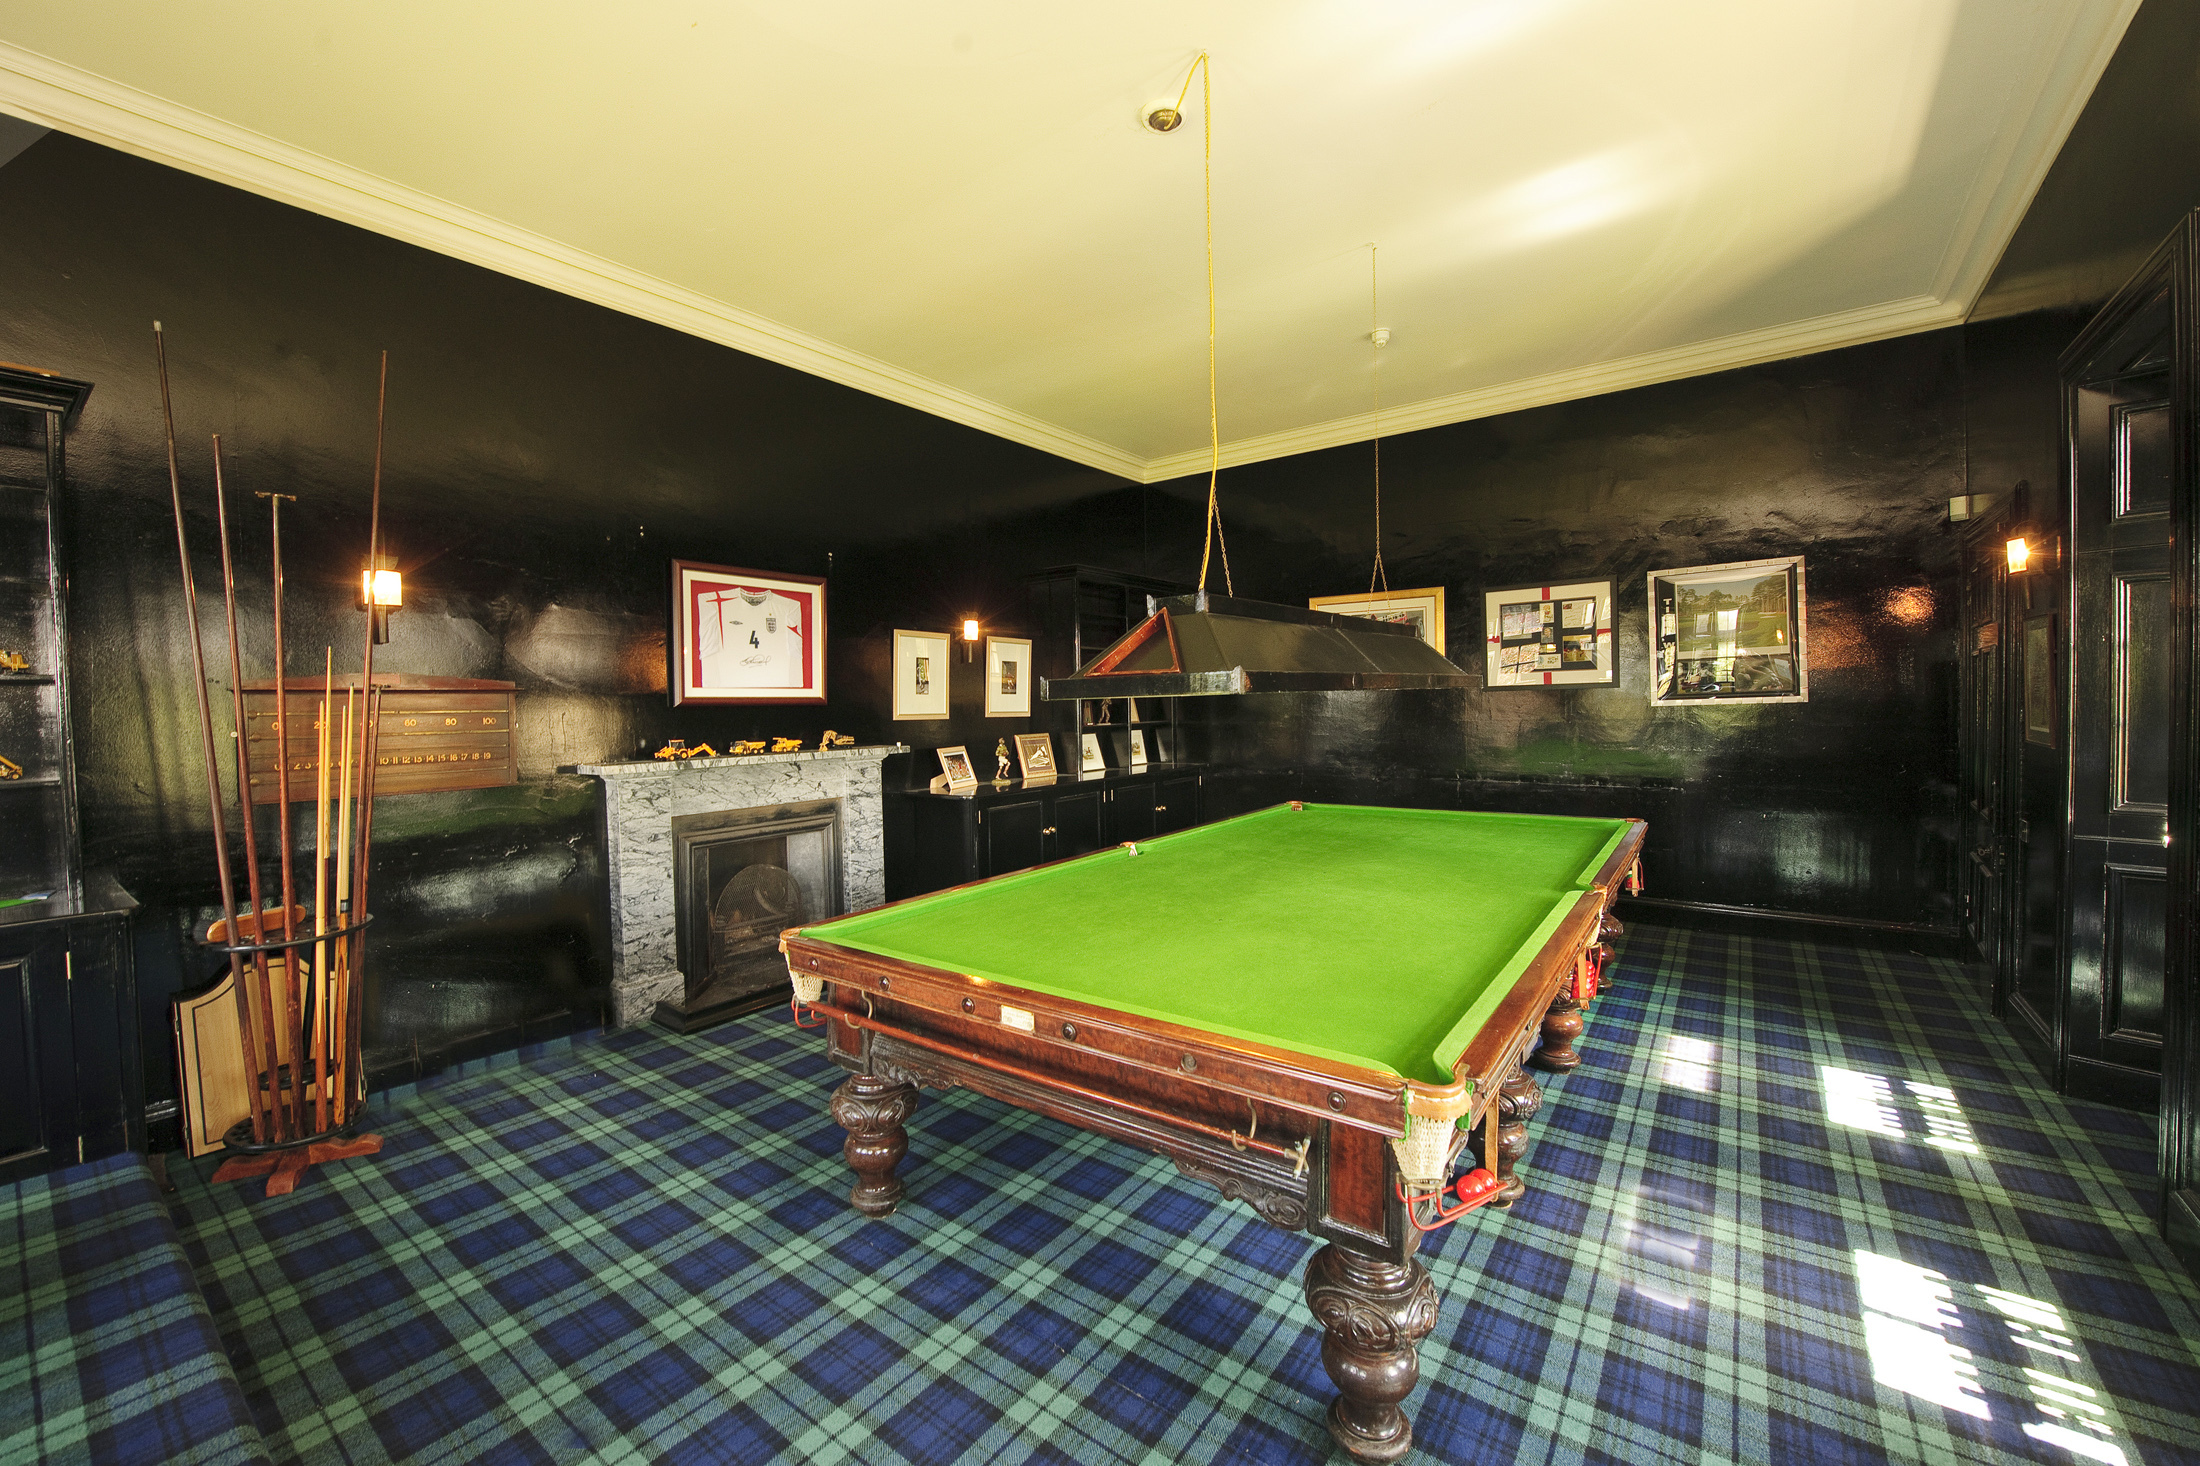 DSC_0912 The Snooker room in main House MEDIUM